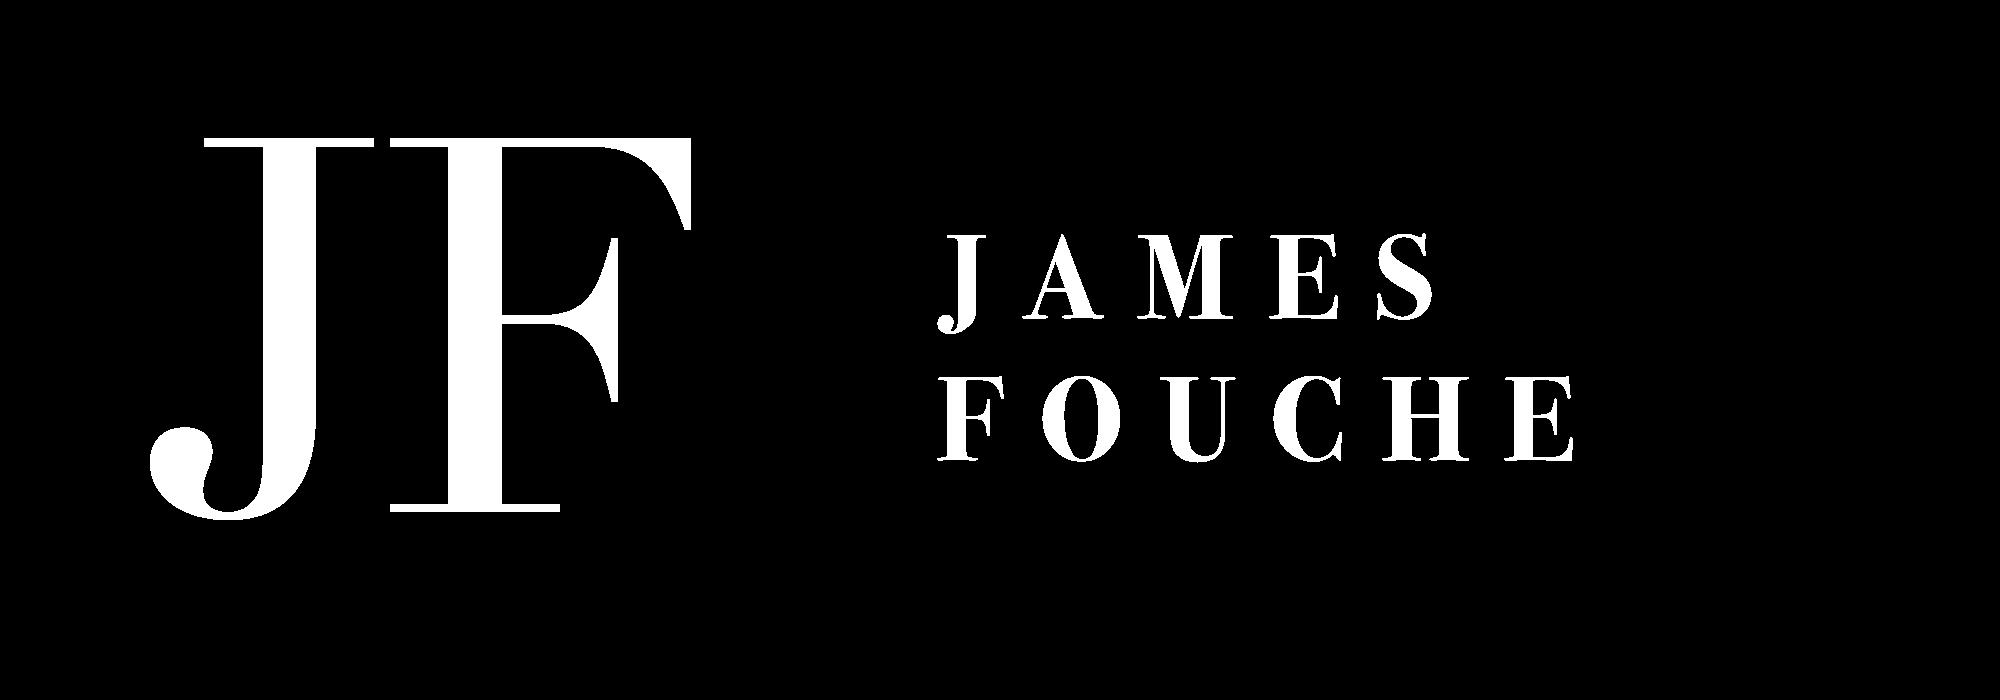 James Fouche